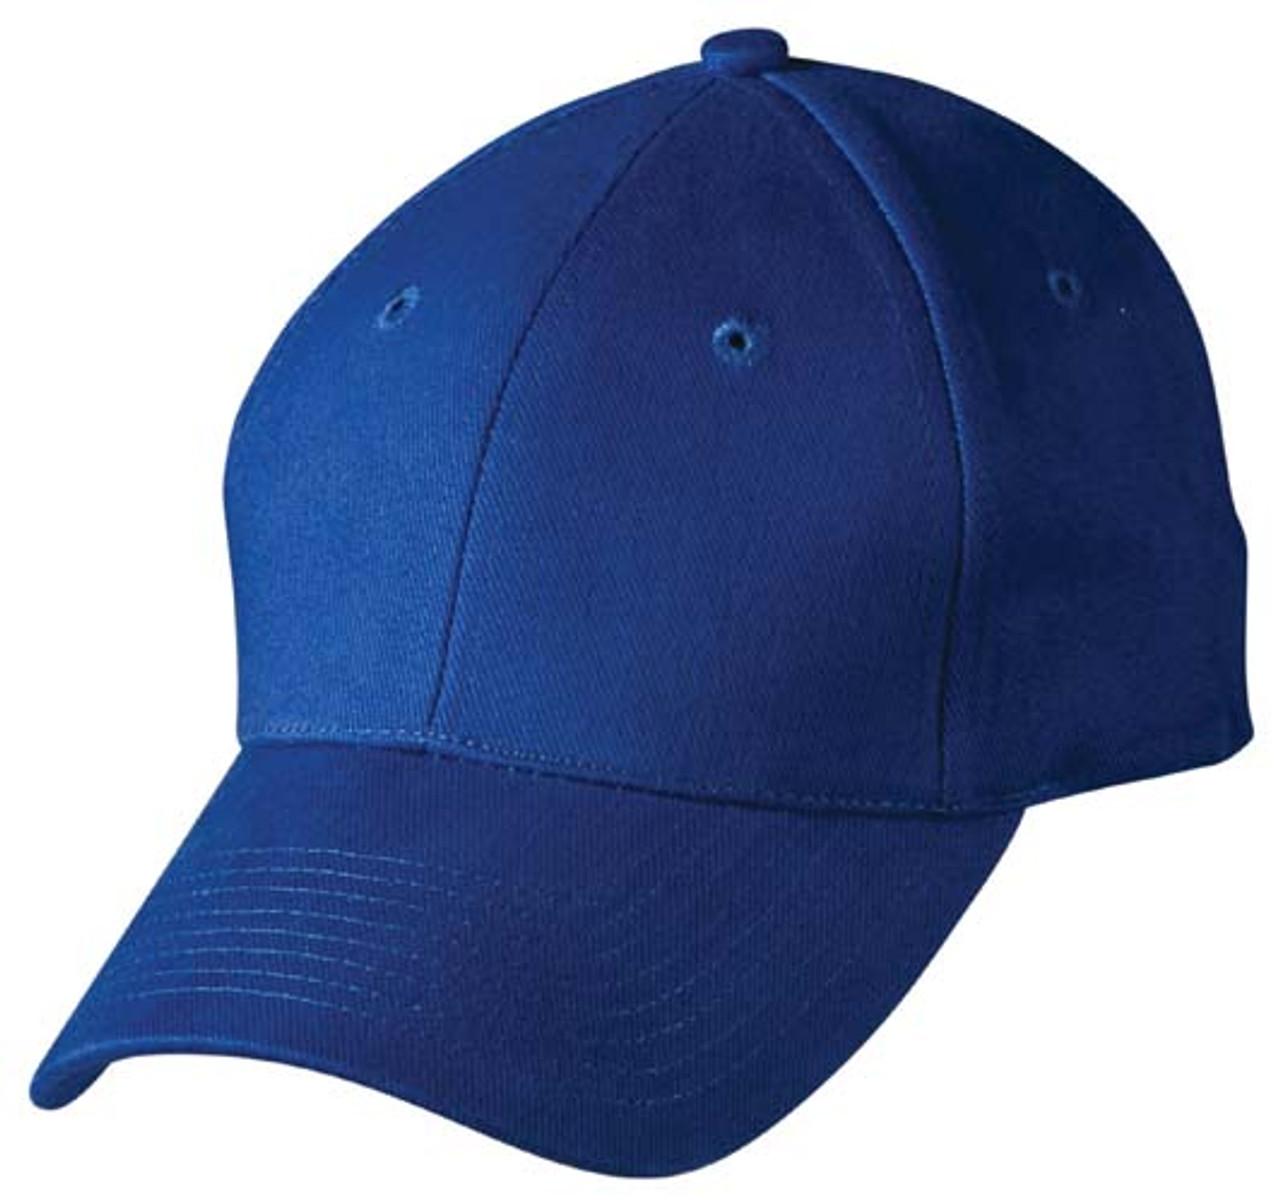 f828c1b6eea Barrio Structured Adult Baseball Caps Australia Hats Online